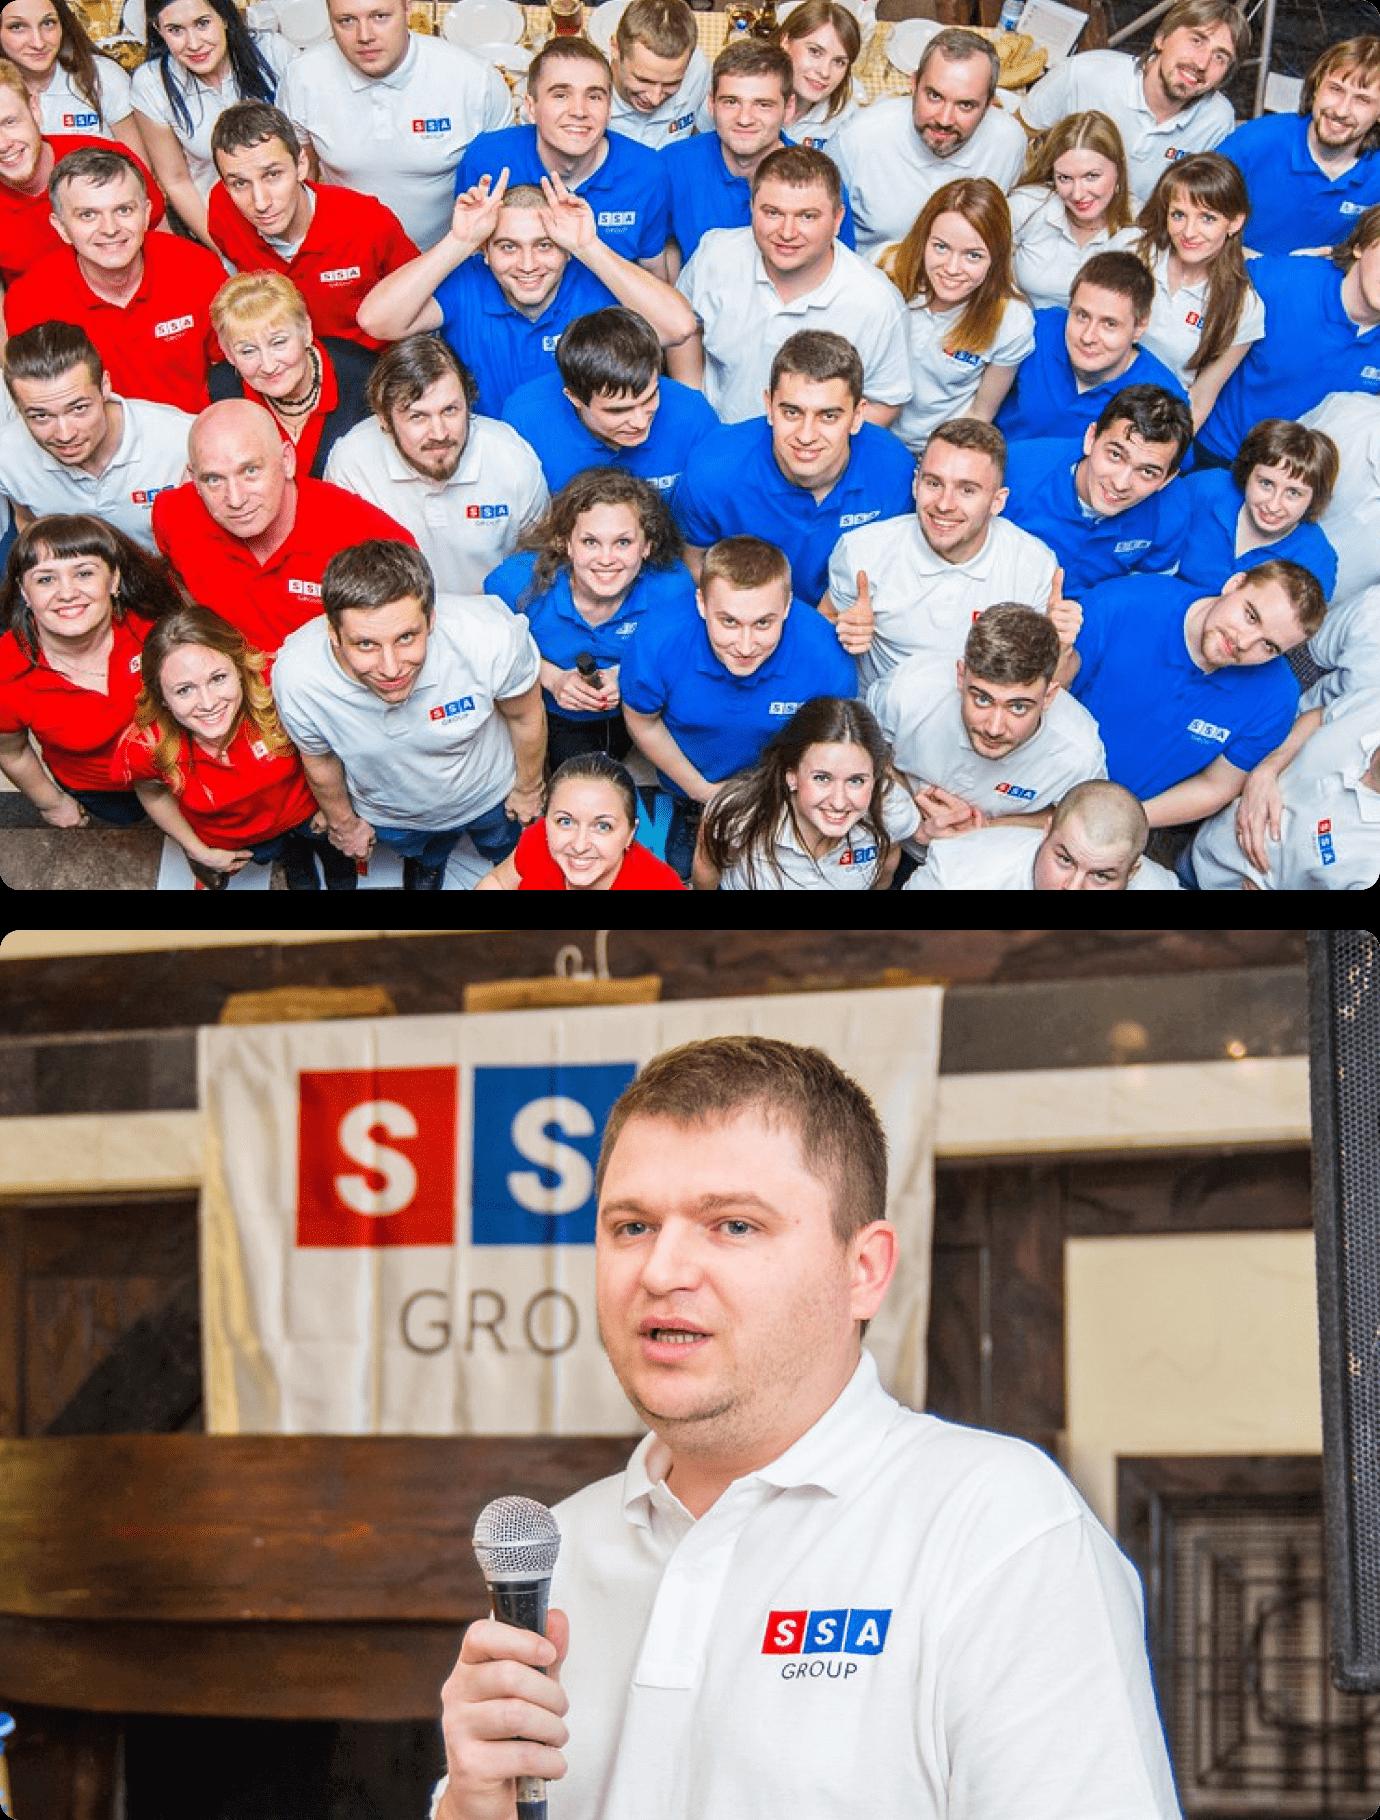 SSA Group history 2016